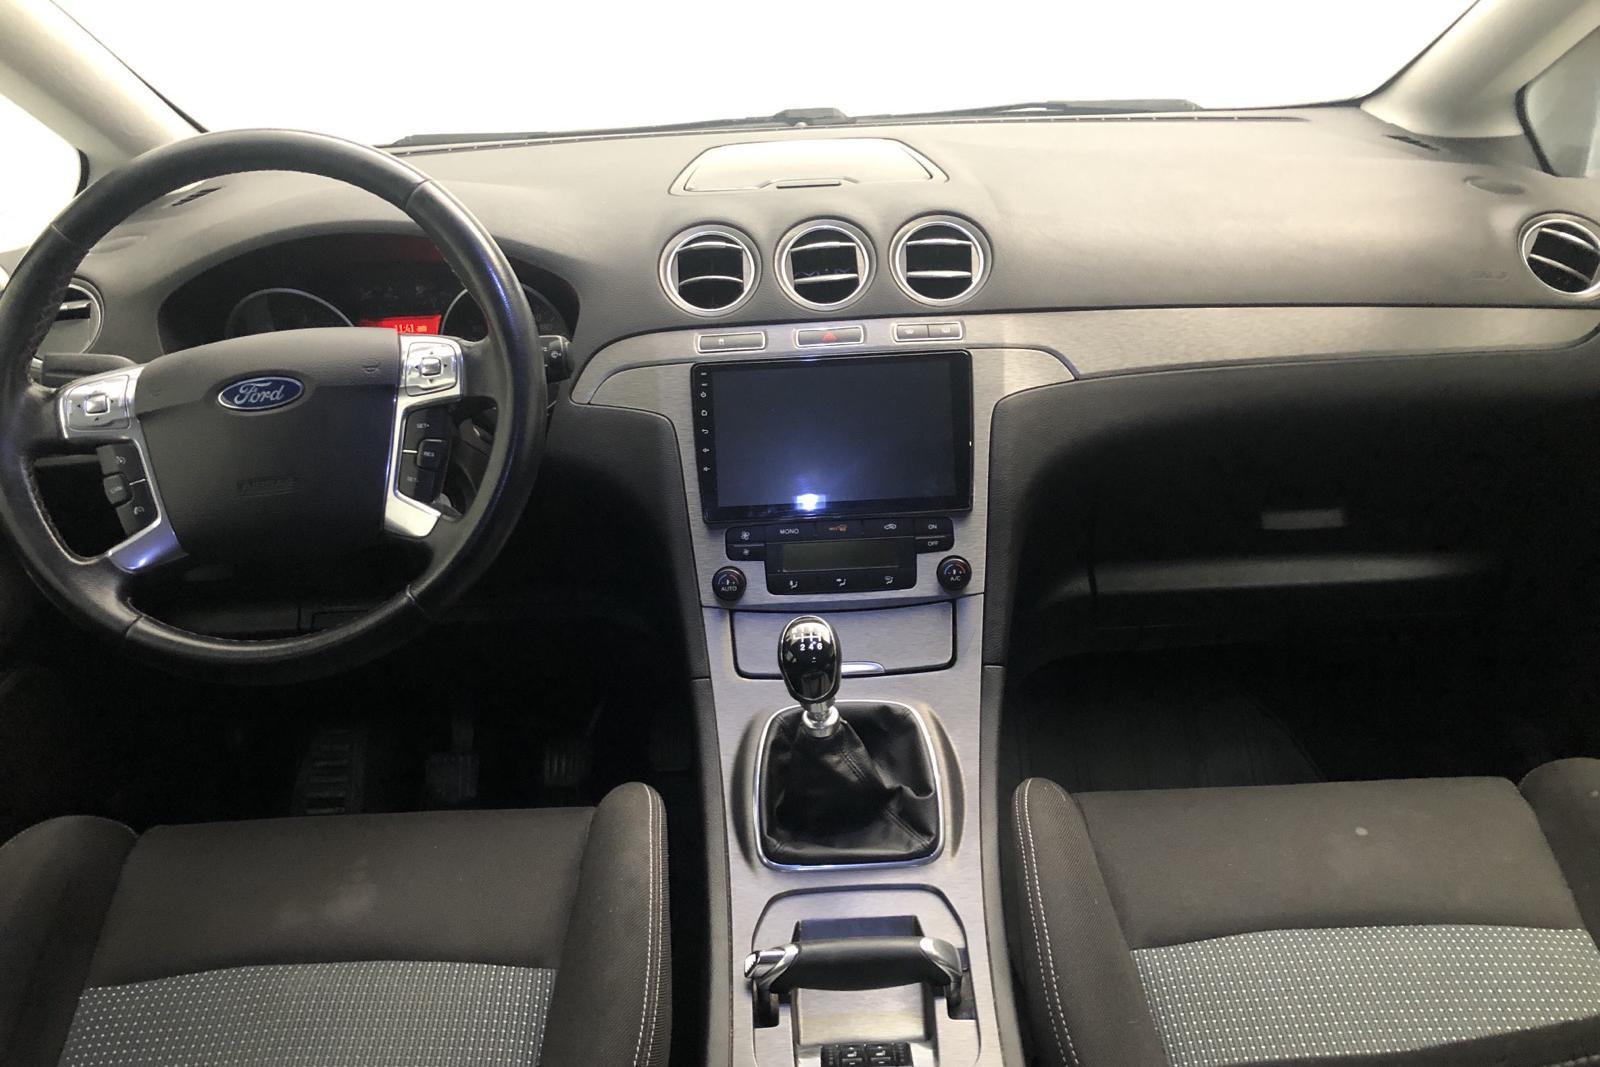 Ford S-MAX 2.0 TDCi (115hk) - 182 550 km - Manual - gray - 2011